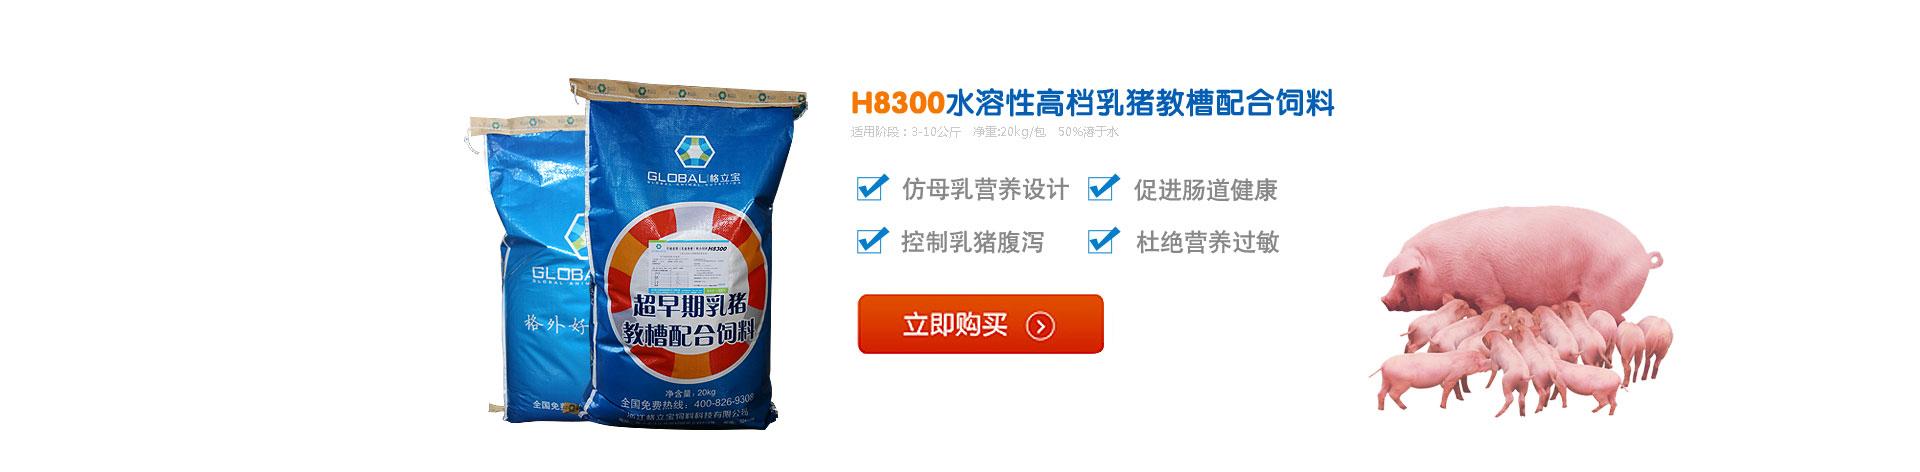 H8300水溶性高档乳猪教槽配合万博manxbet官网